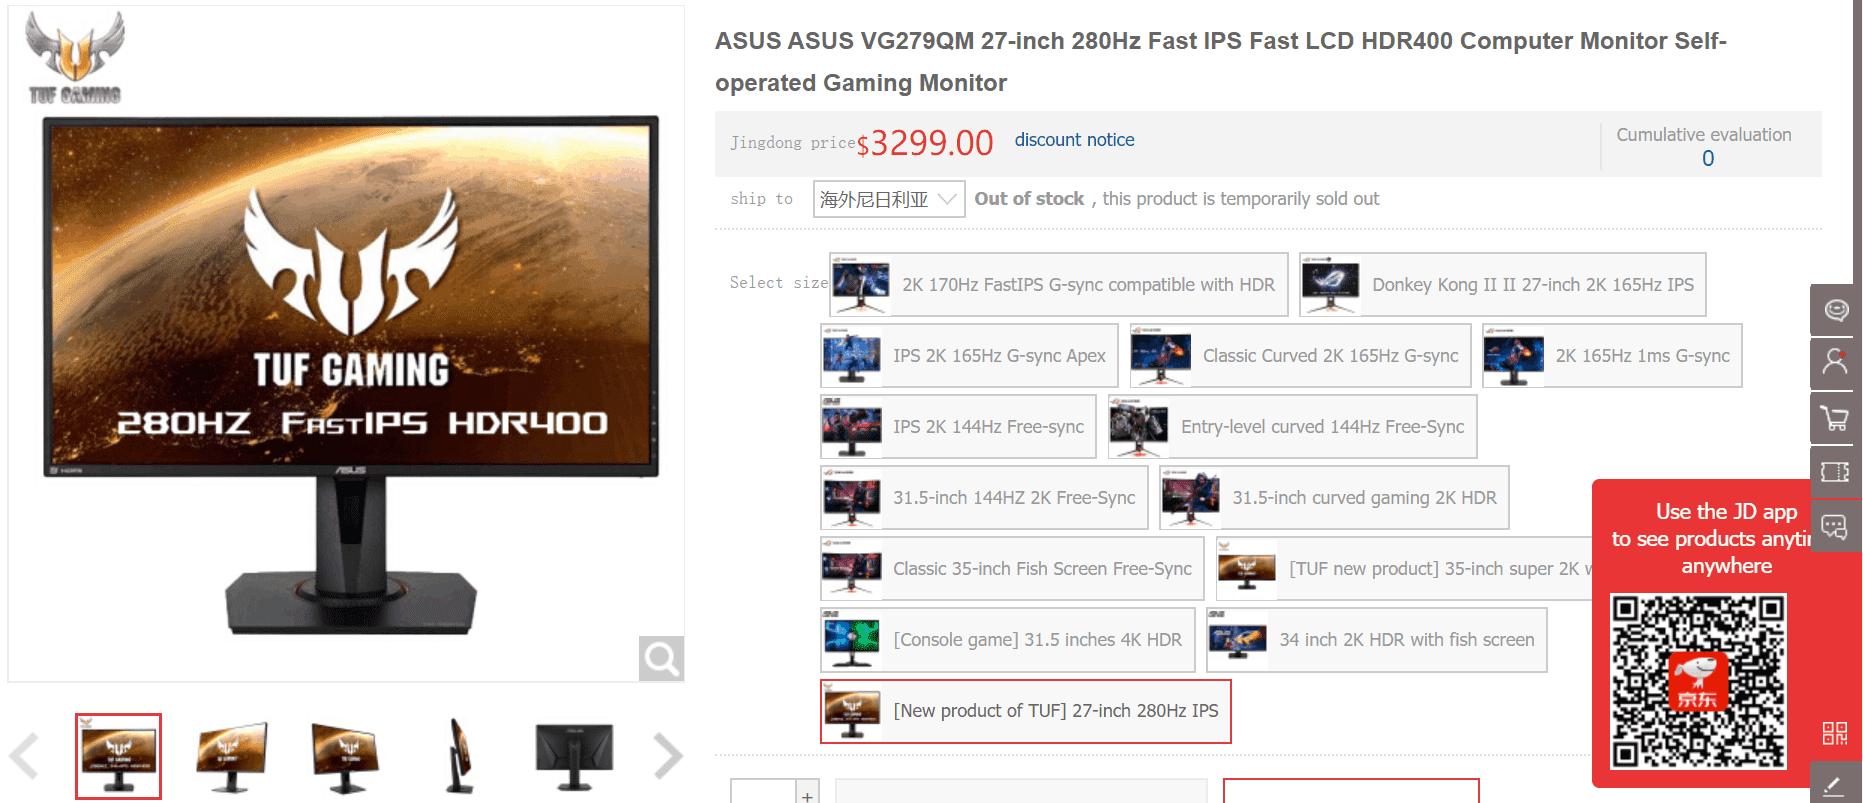 Photo of ASUS تطلق شاشة IPS للألعاب بمعدل تحديث 280HZ وسرعة فائقة في الإستجابة